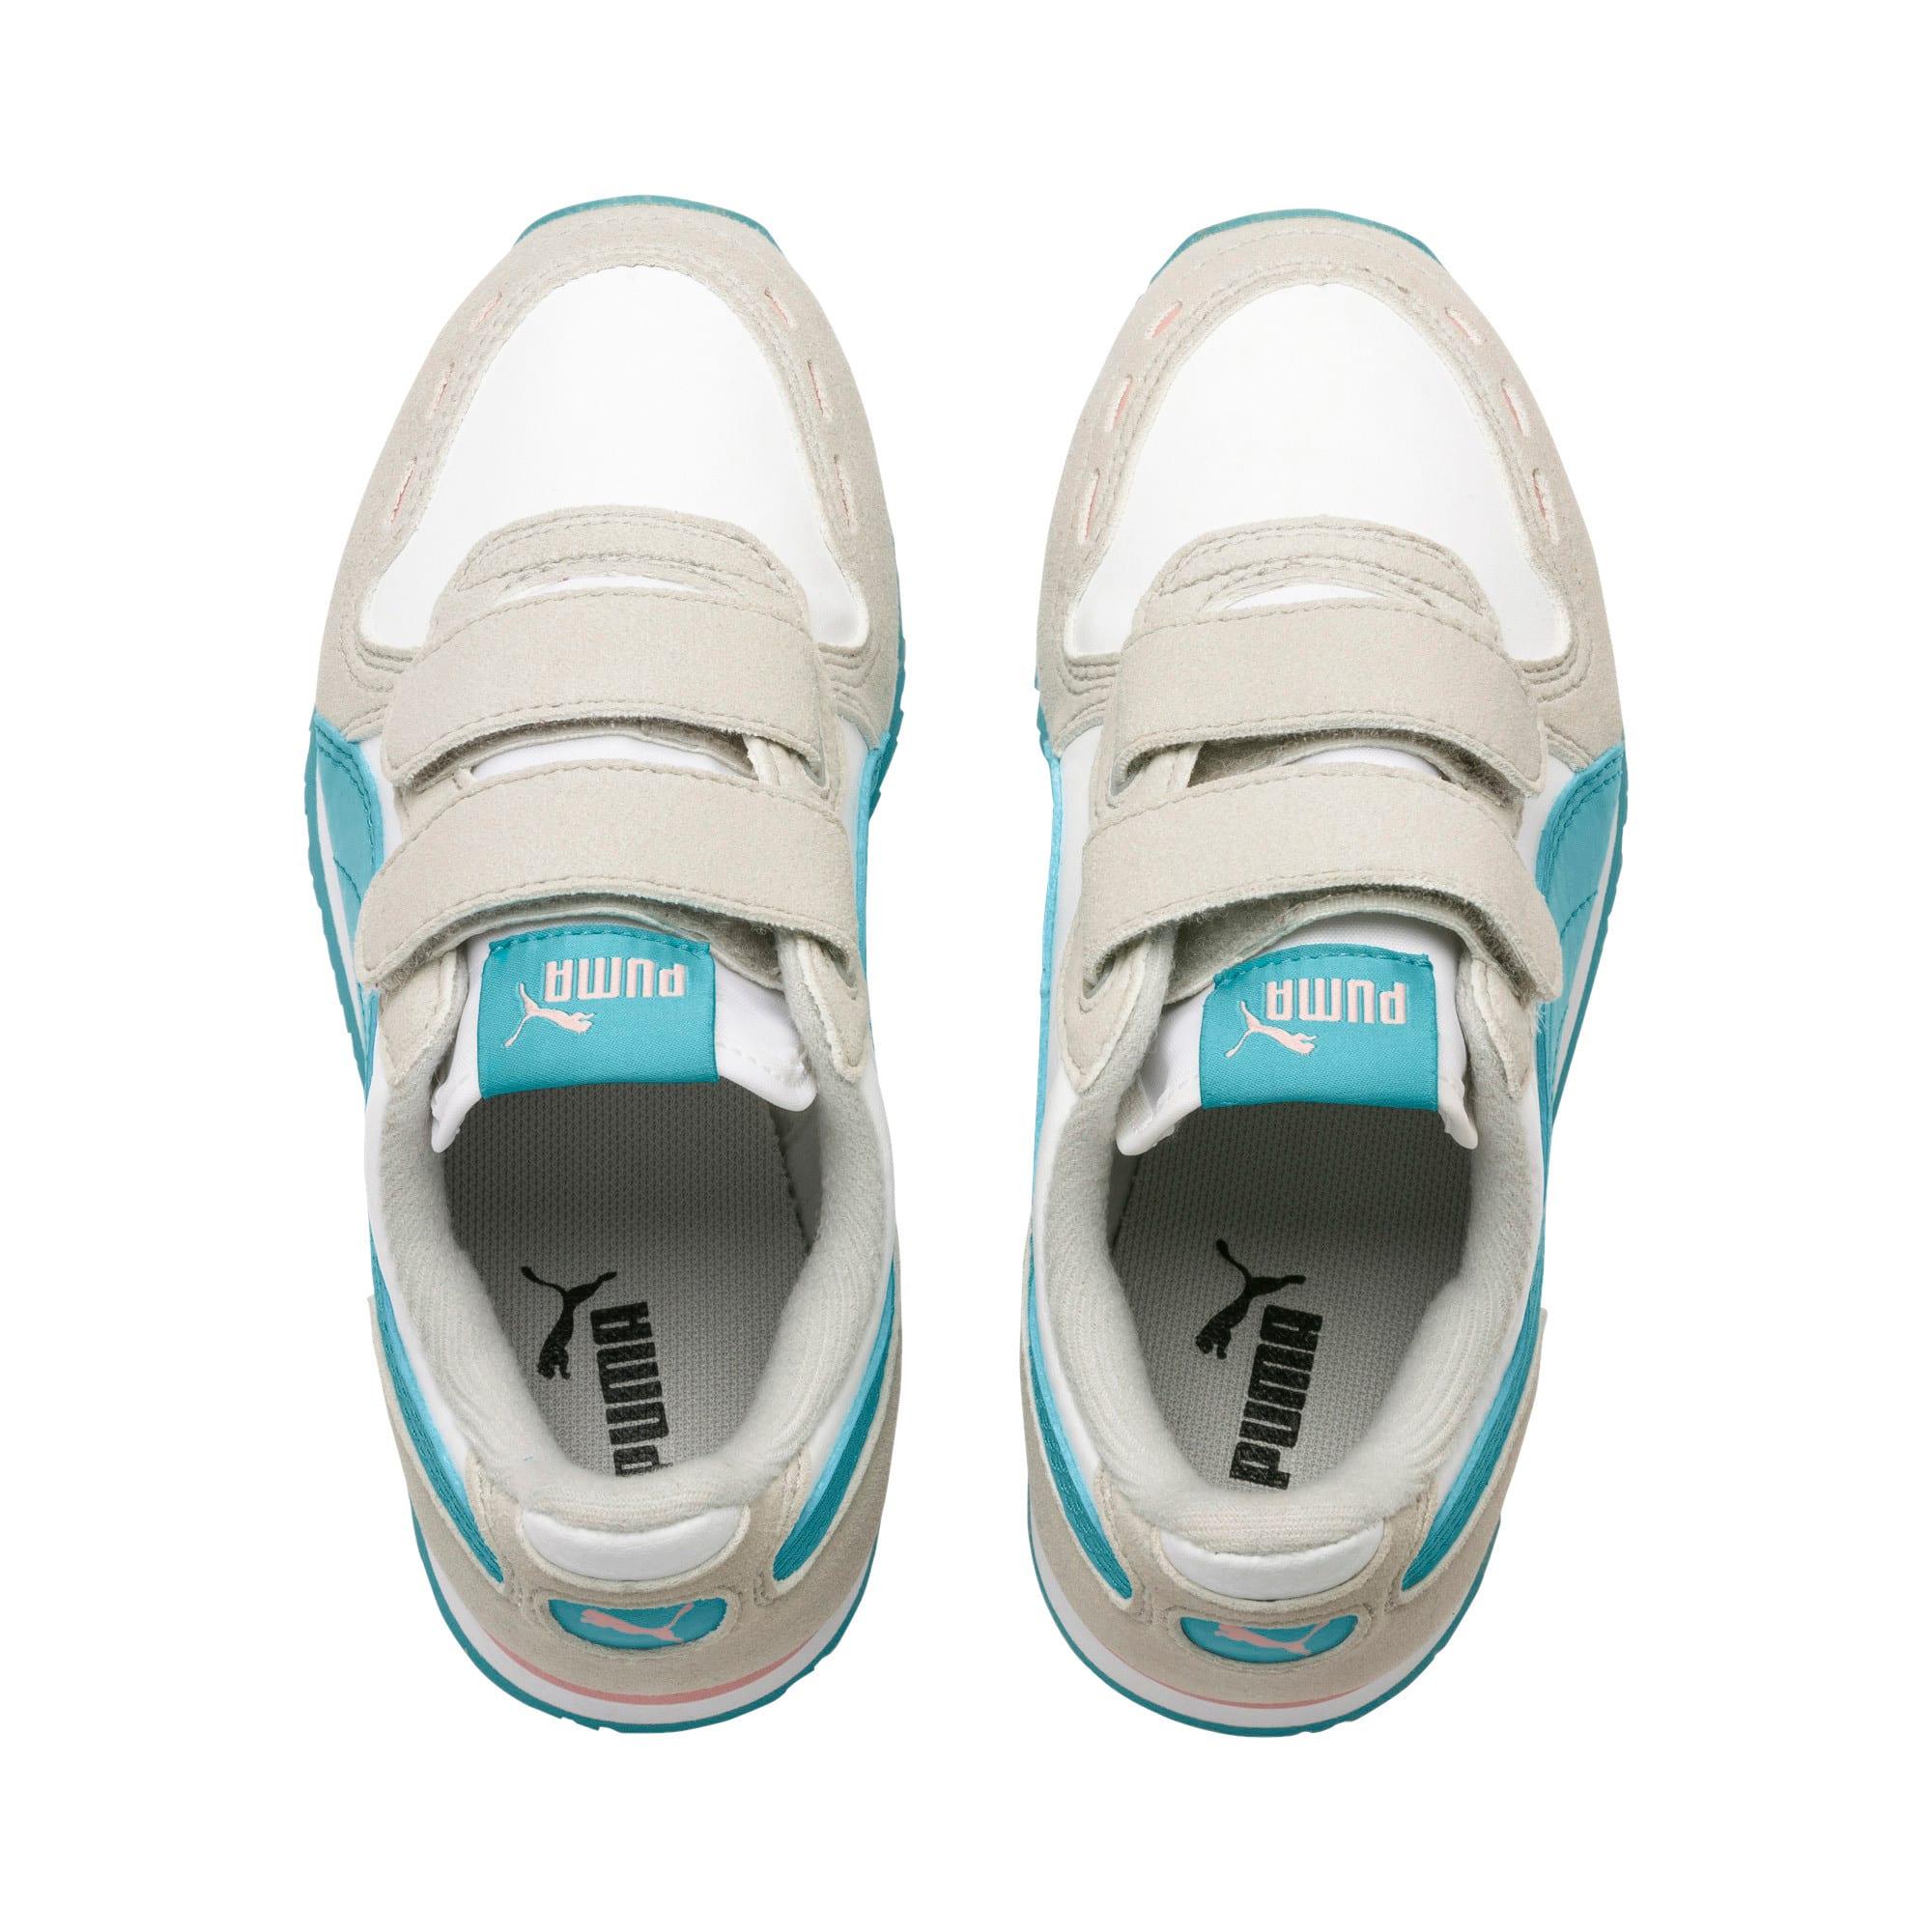 Thumbnail 6 of Cabana Racer SL V PS Baby Sneaker, Puma White-Milky Blue, medium